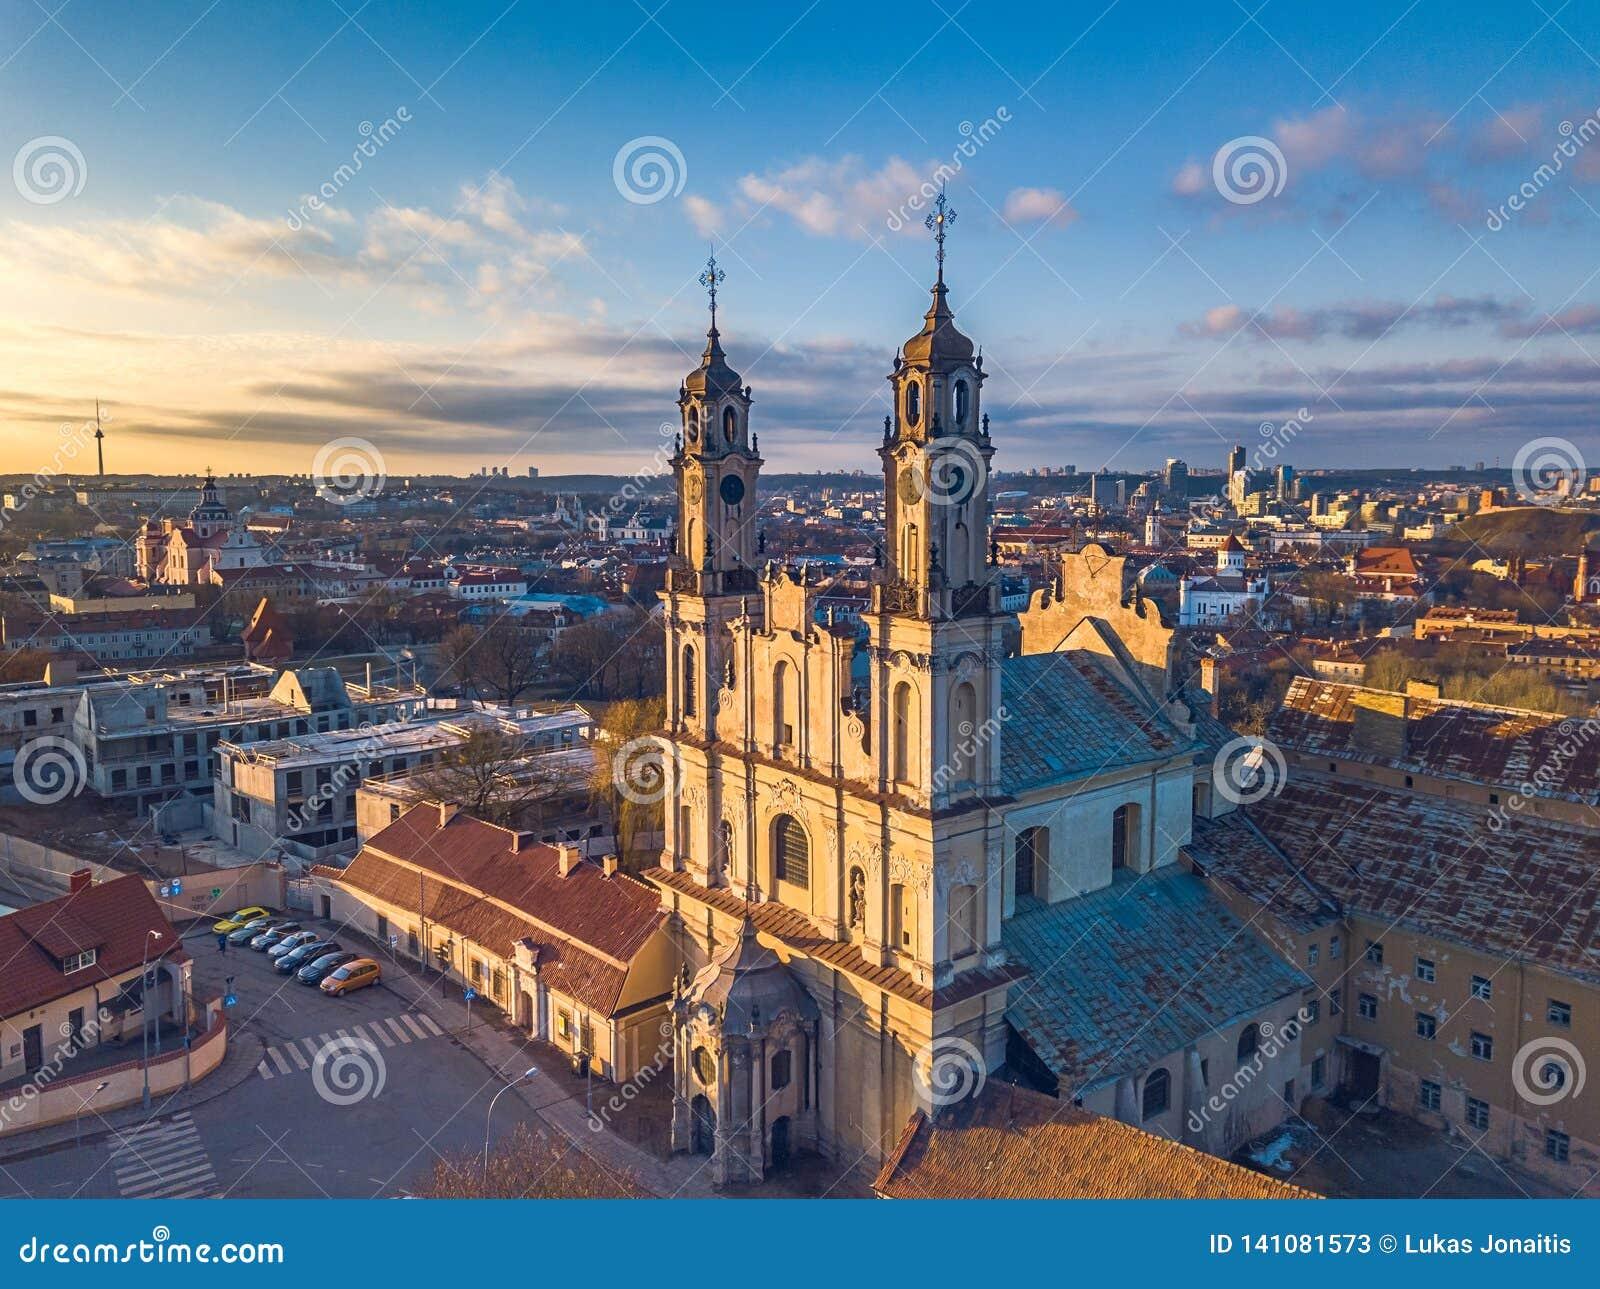 VILNIUS, LITHUANIA - widoku z lotu ptaka Misionieriai kościół